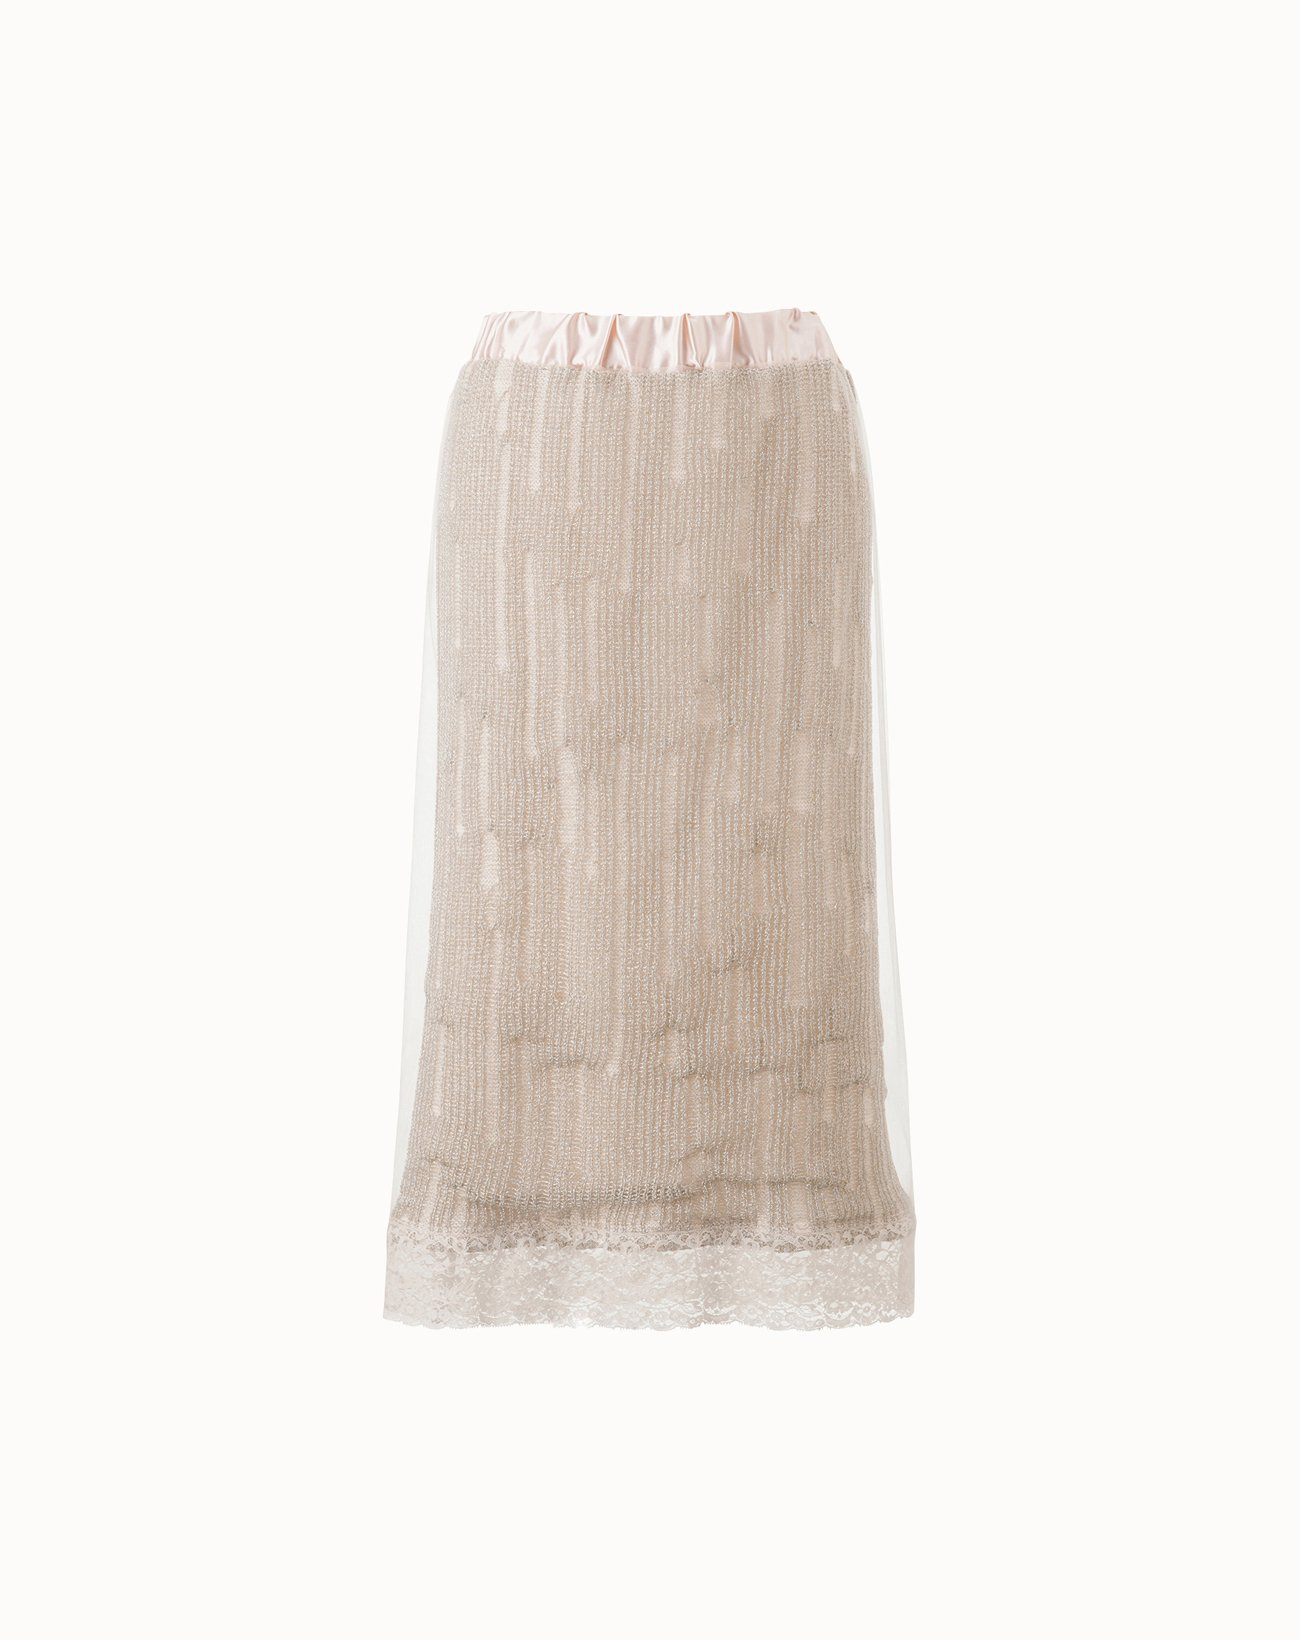 Lame Knit Skirt  - Off White